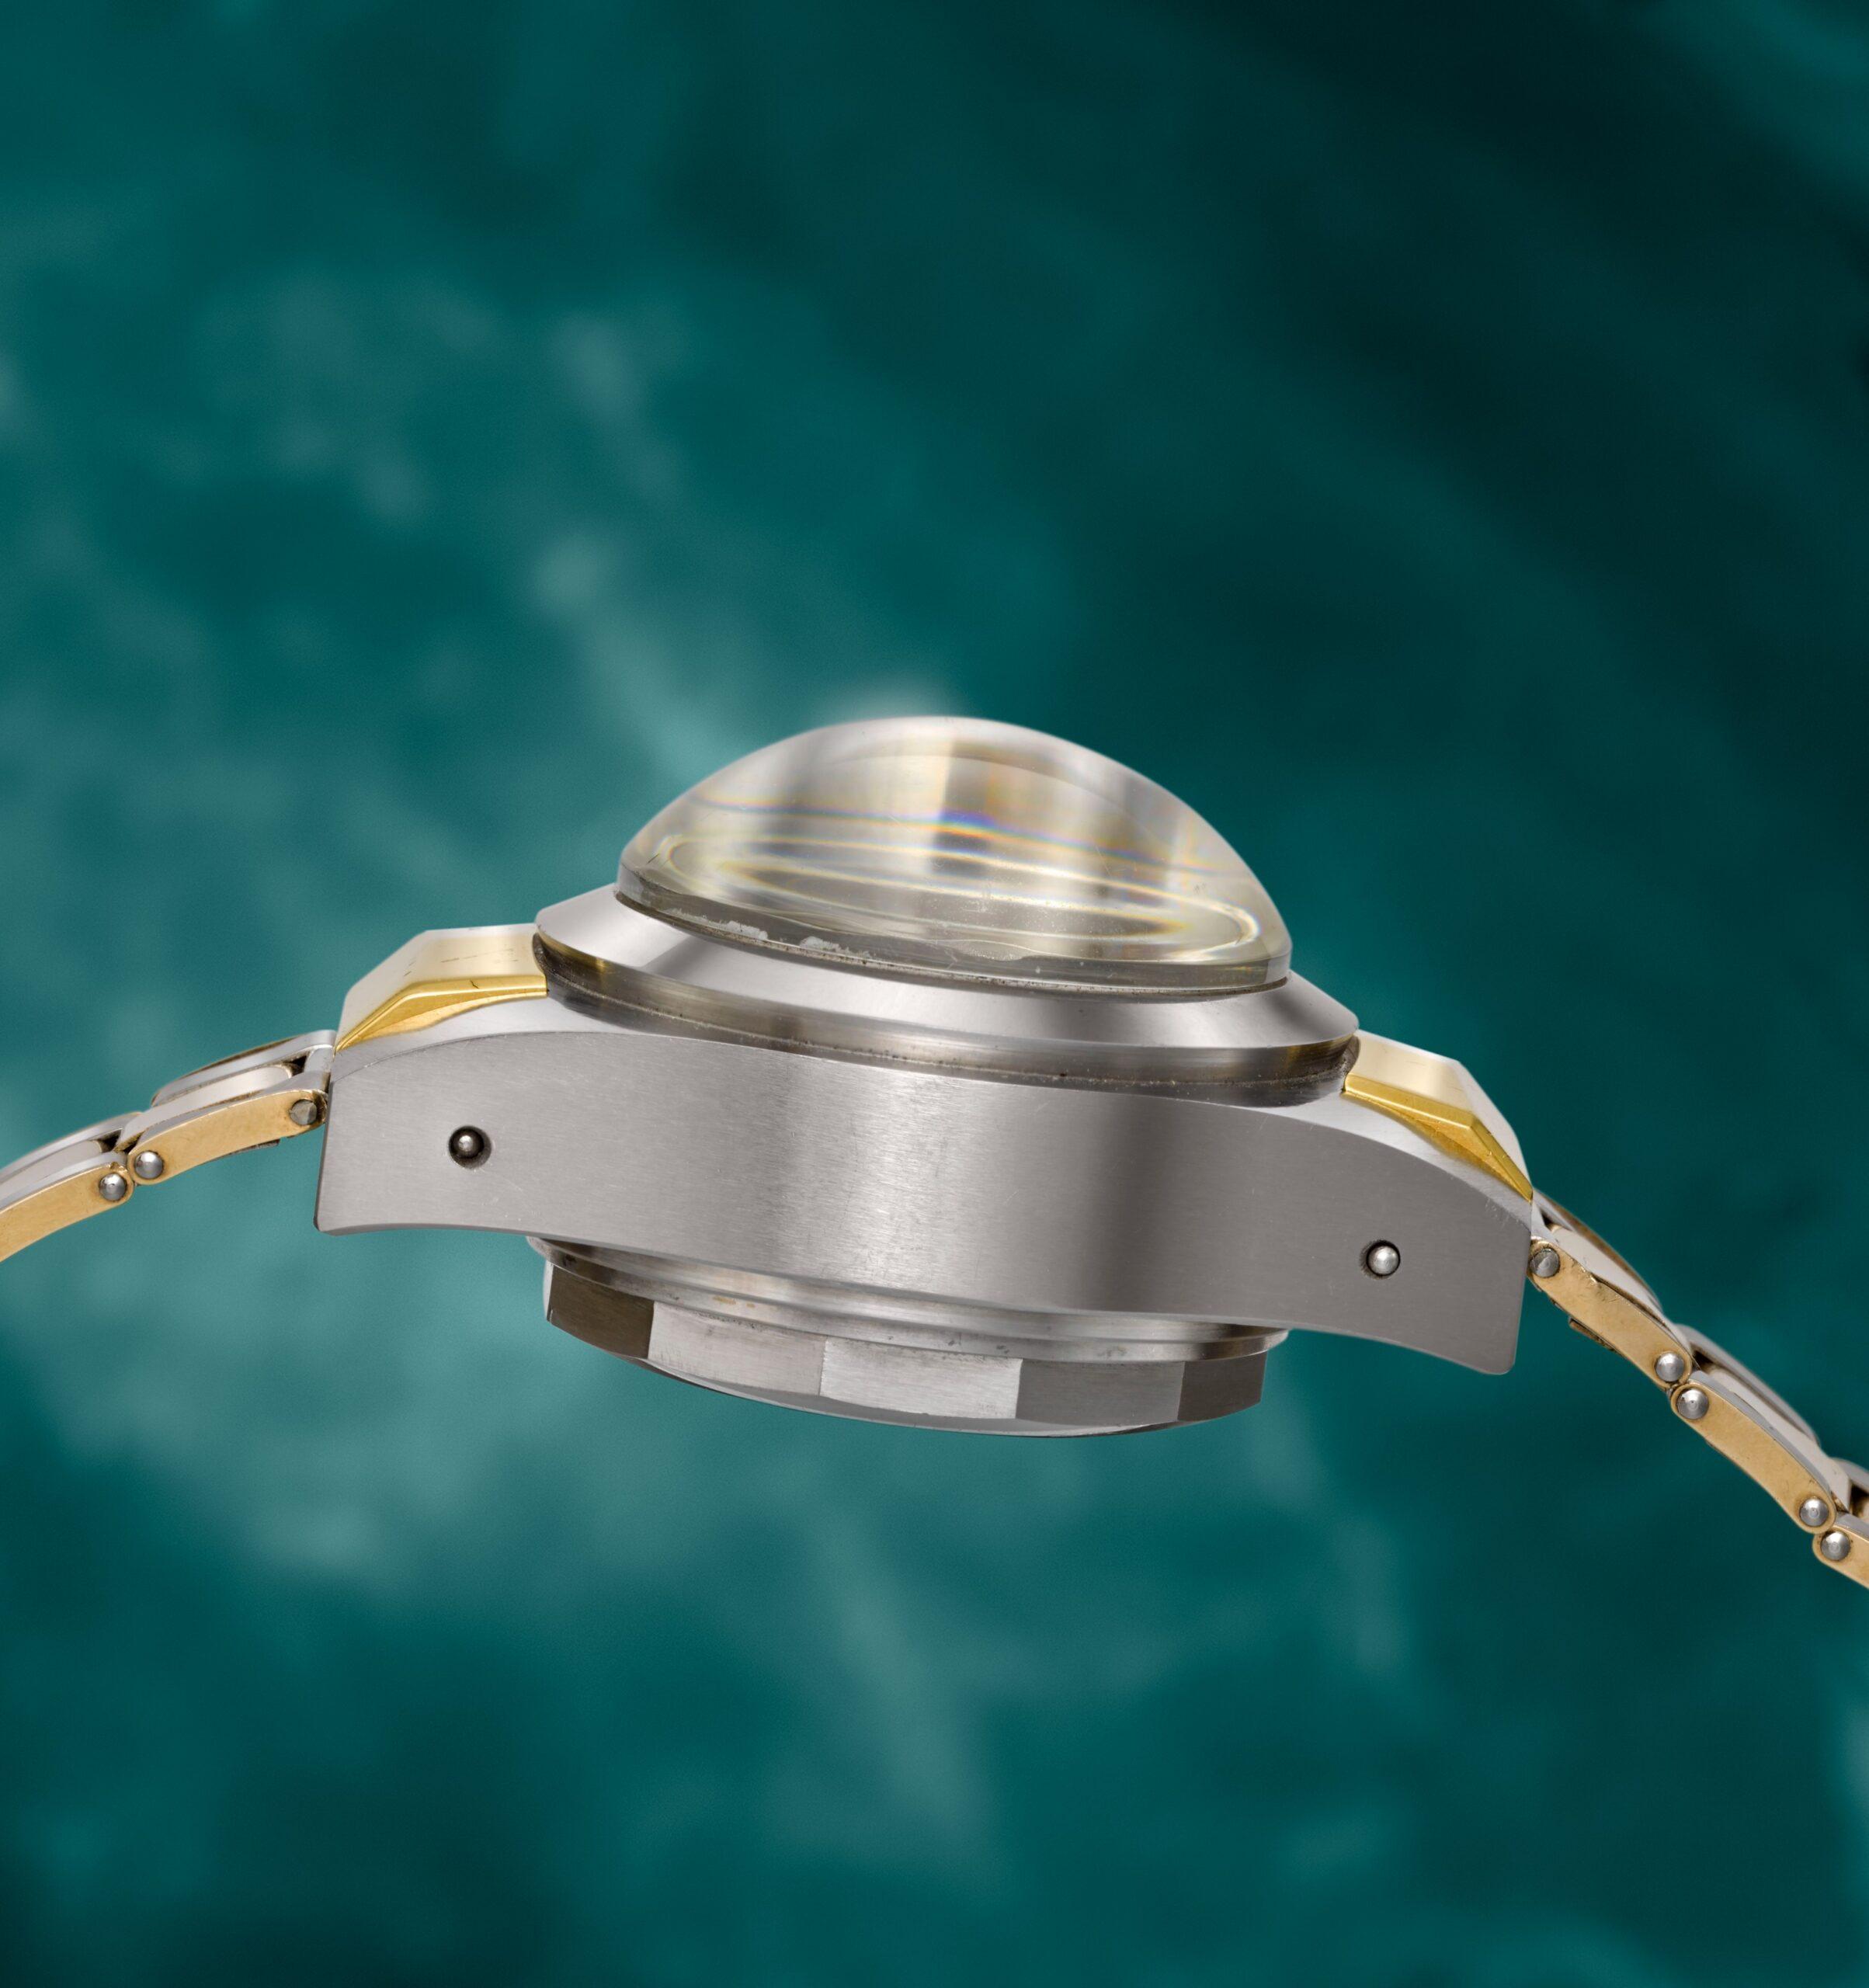 The Rolex Experimental Deep Sea Special N°1